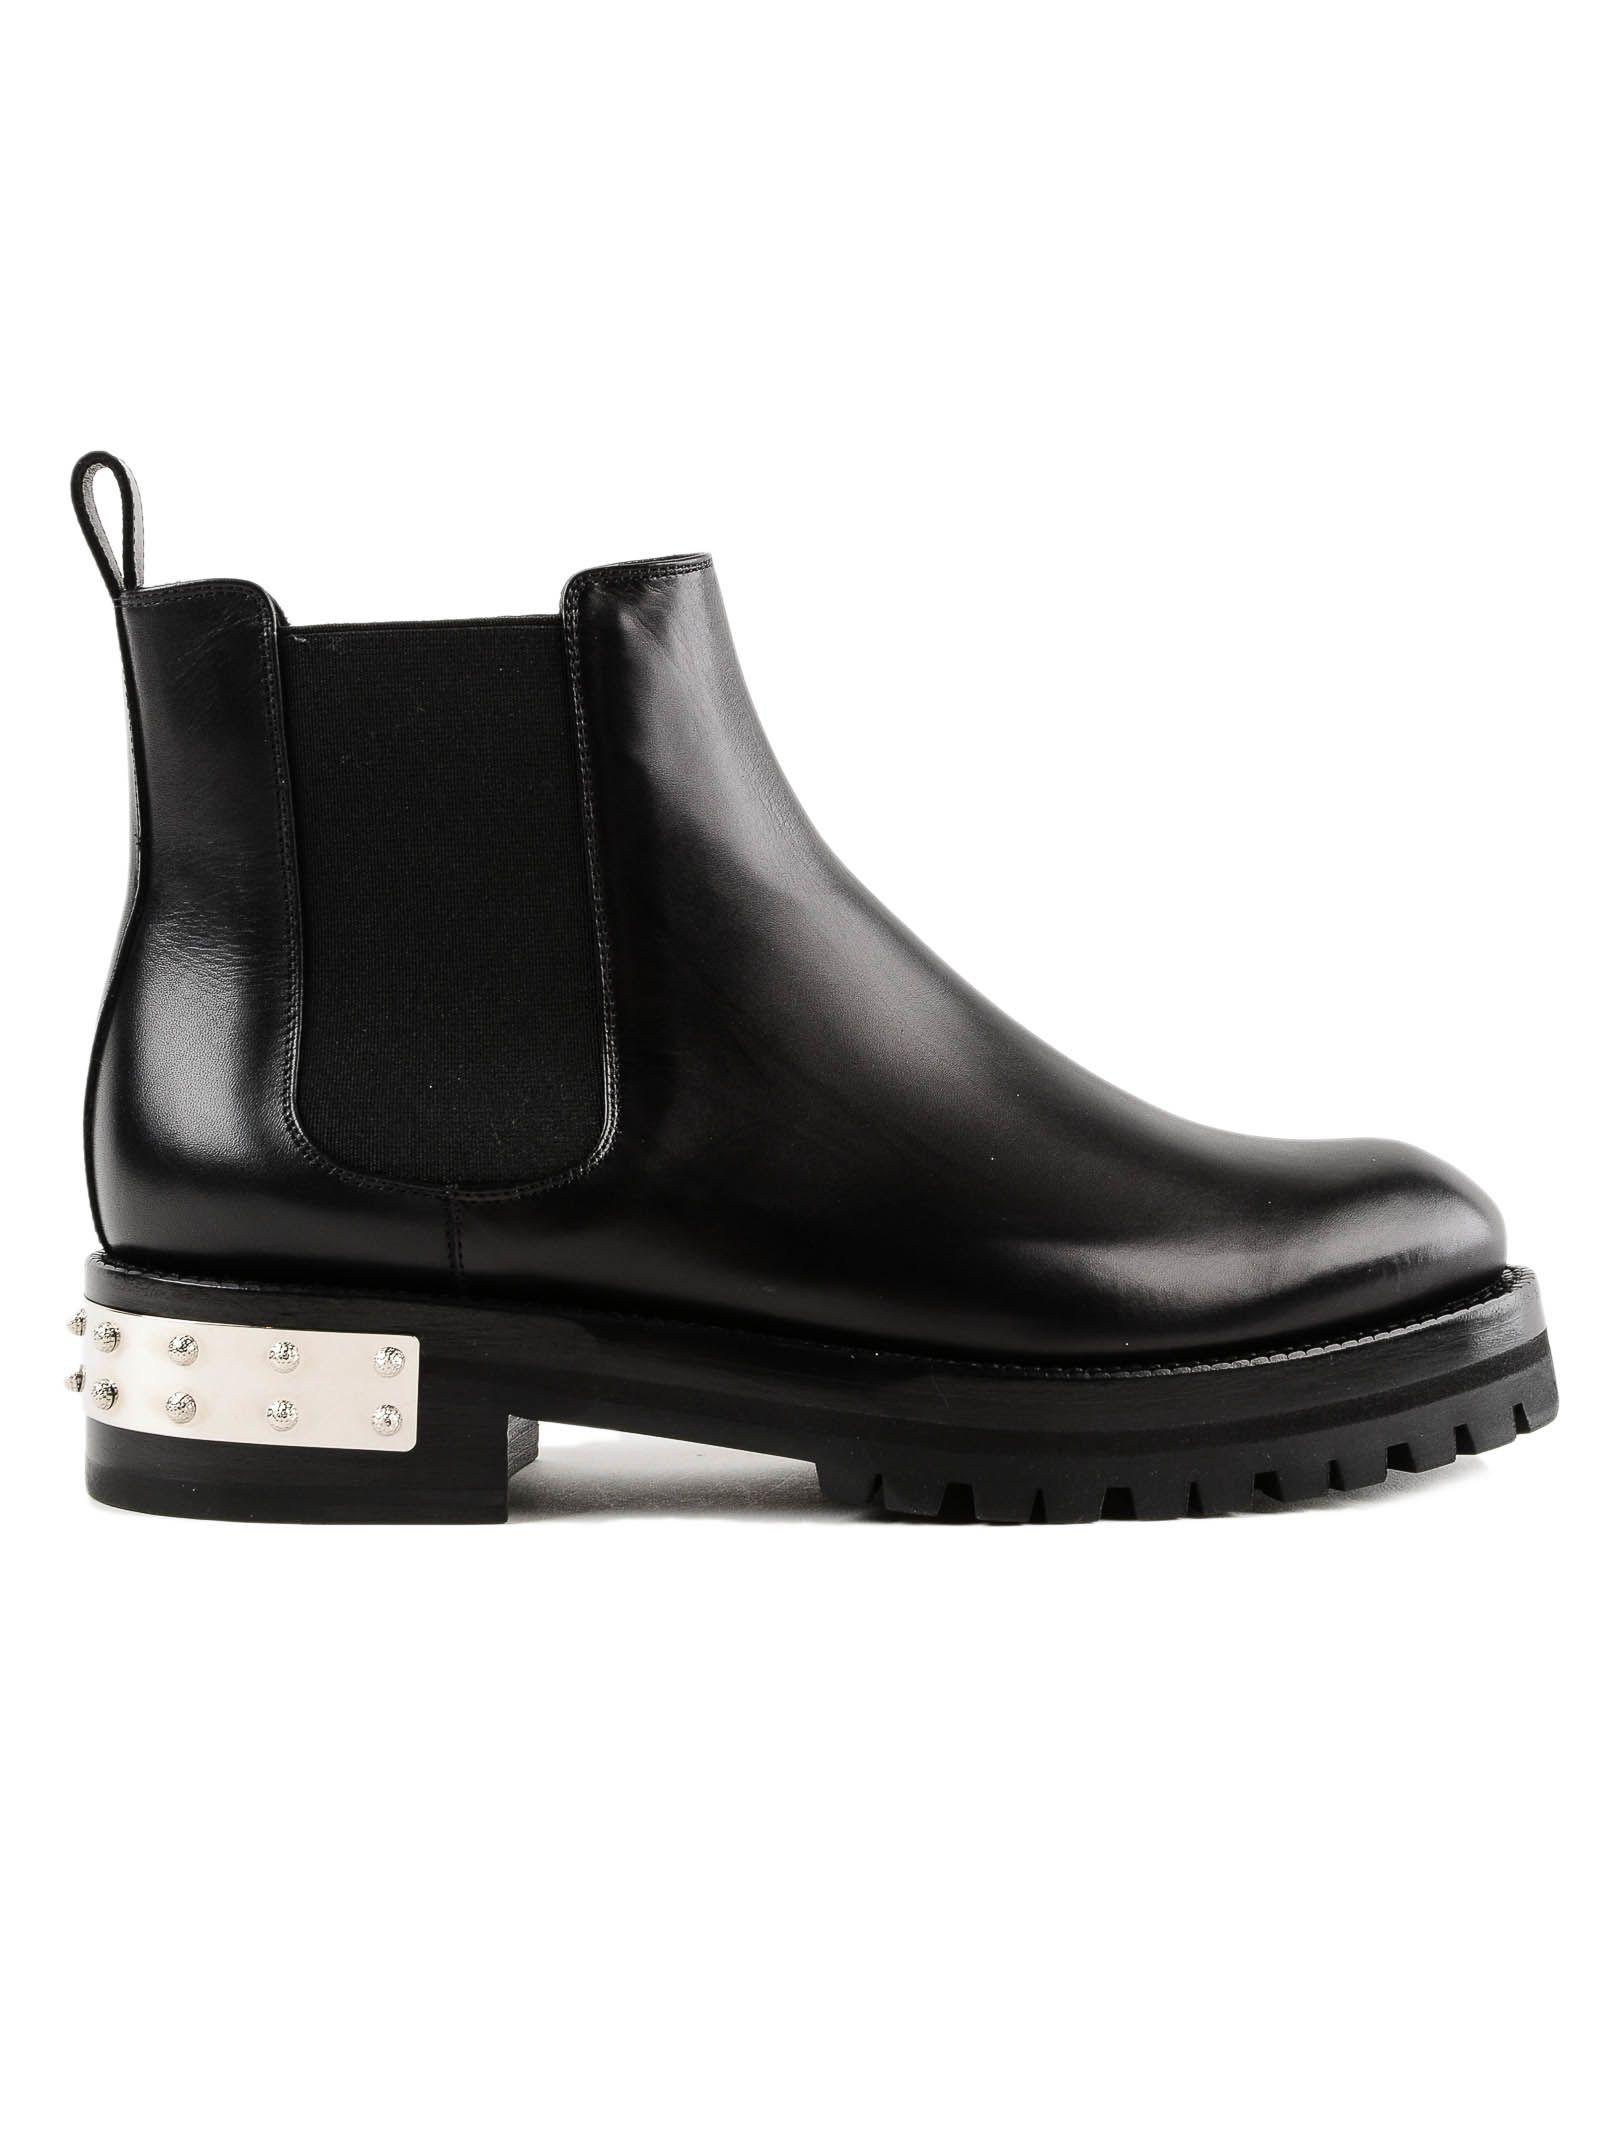 Alexander Mcqueen Flat Ankle Boots